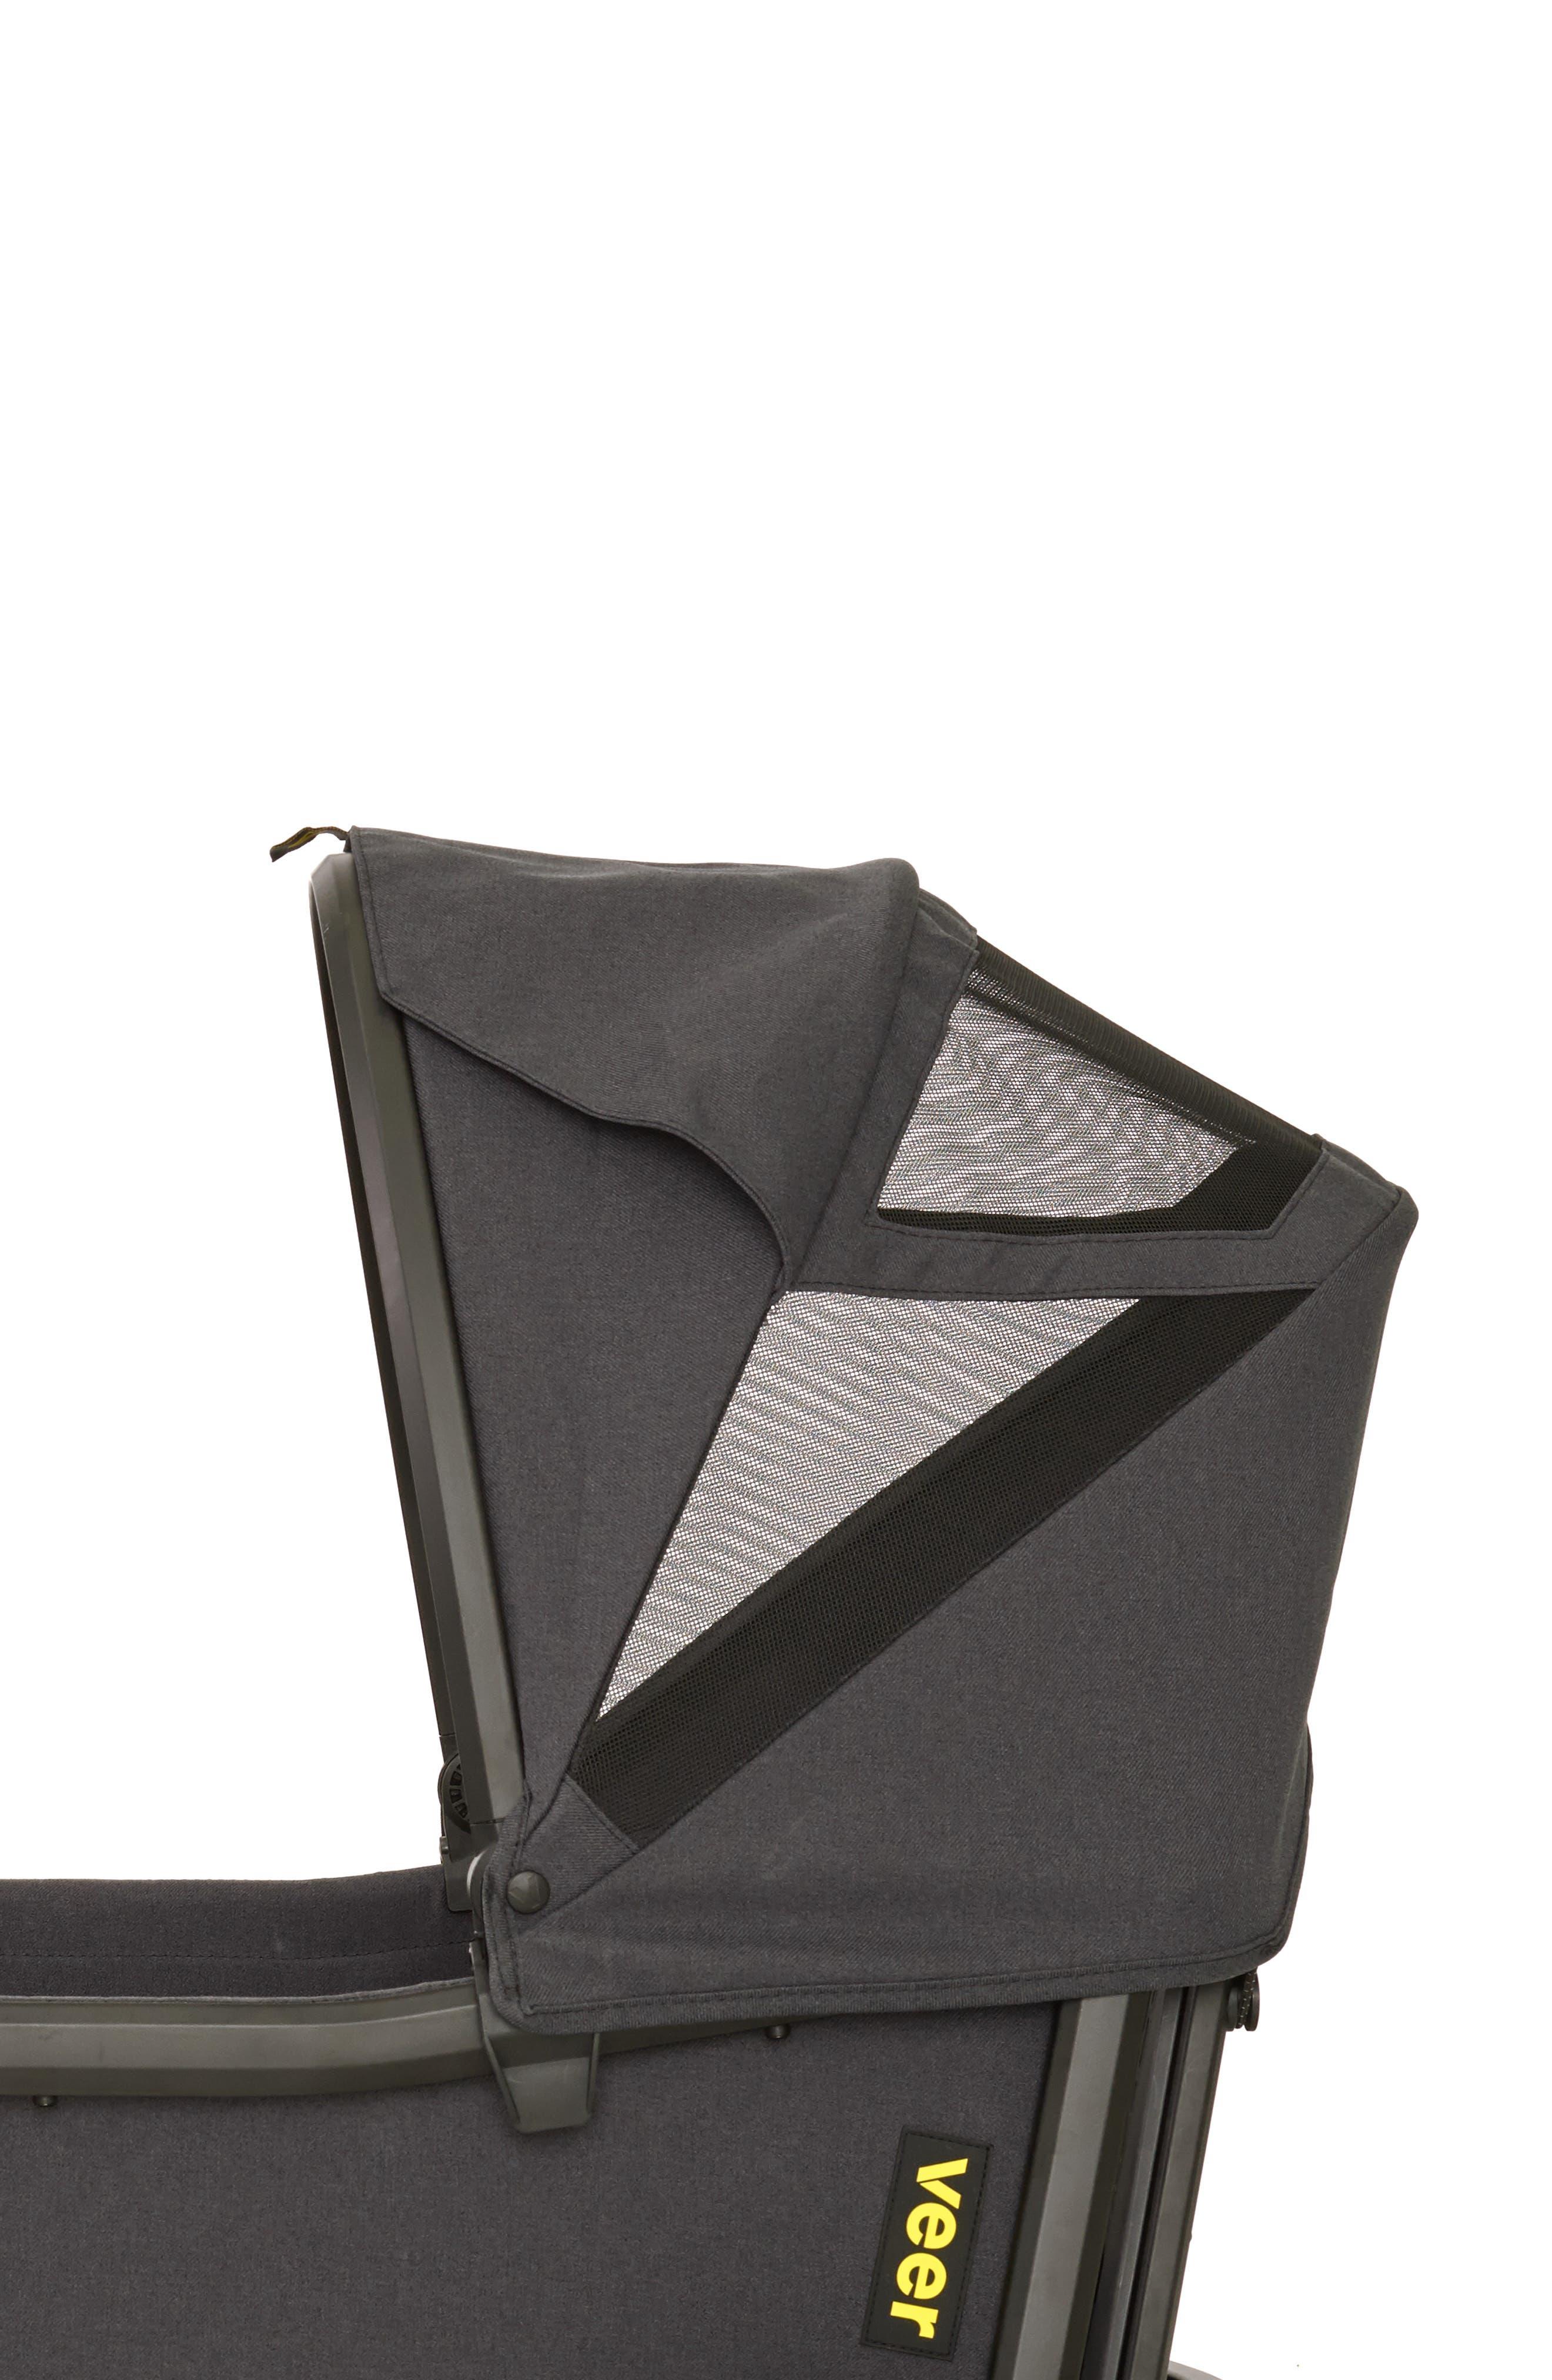 Retractable Canopy,                             Main thumbnail 1, color,                             BLACK